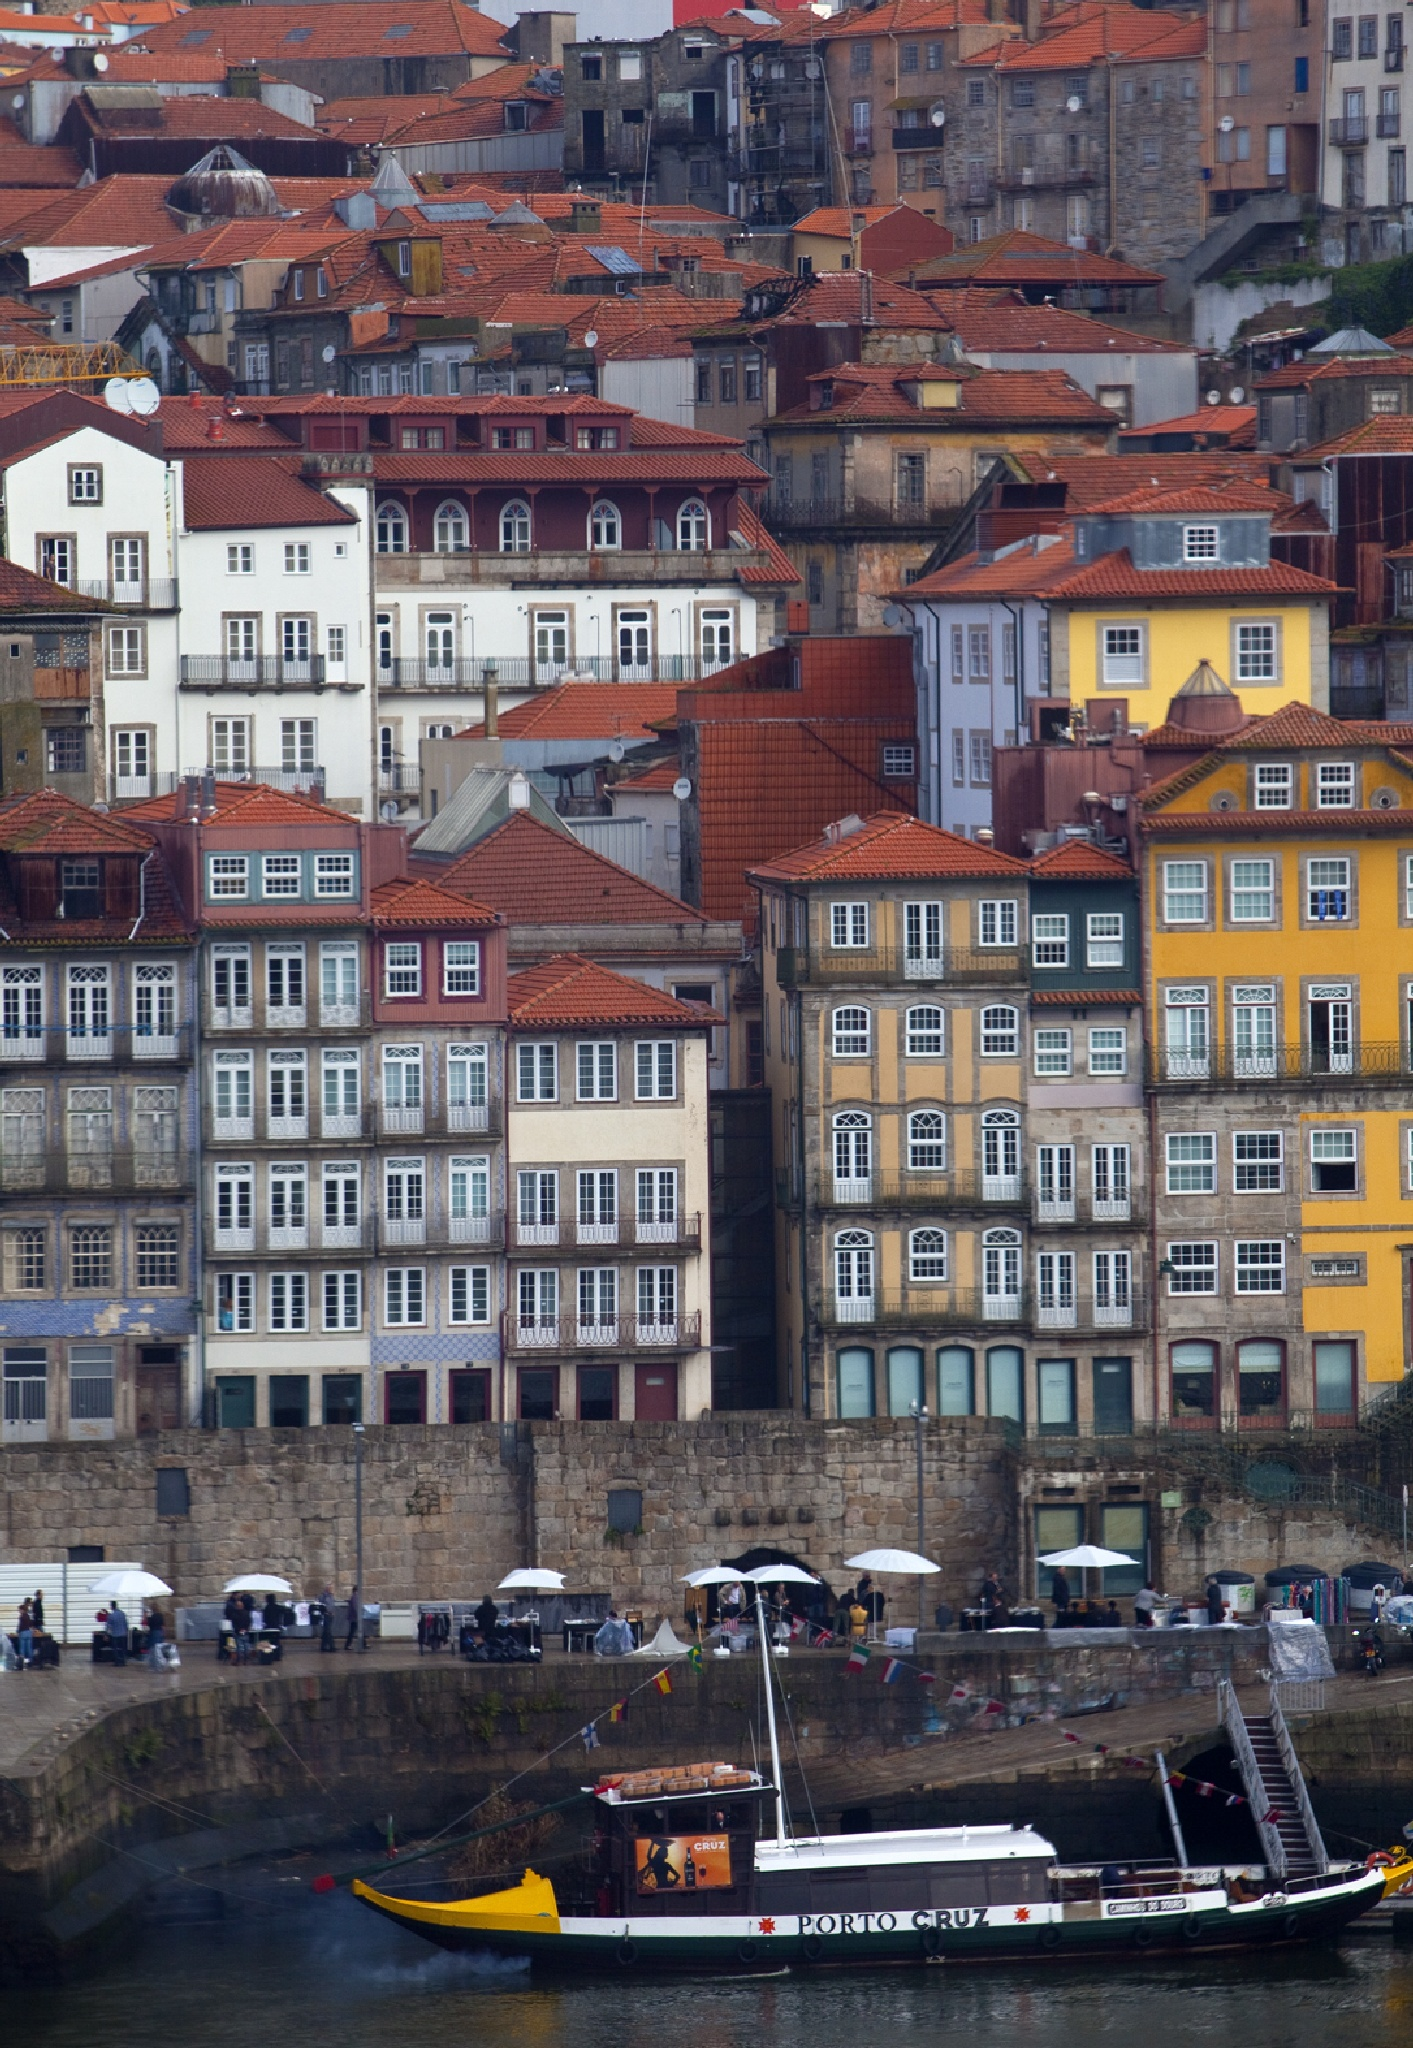 Porto, Portugal by JaneCampbell21